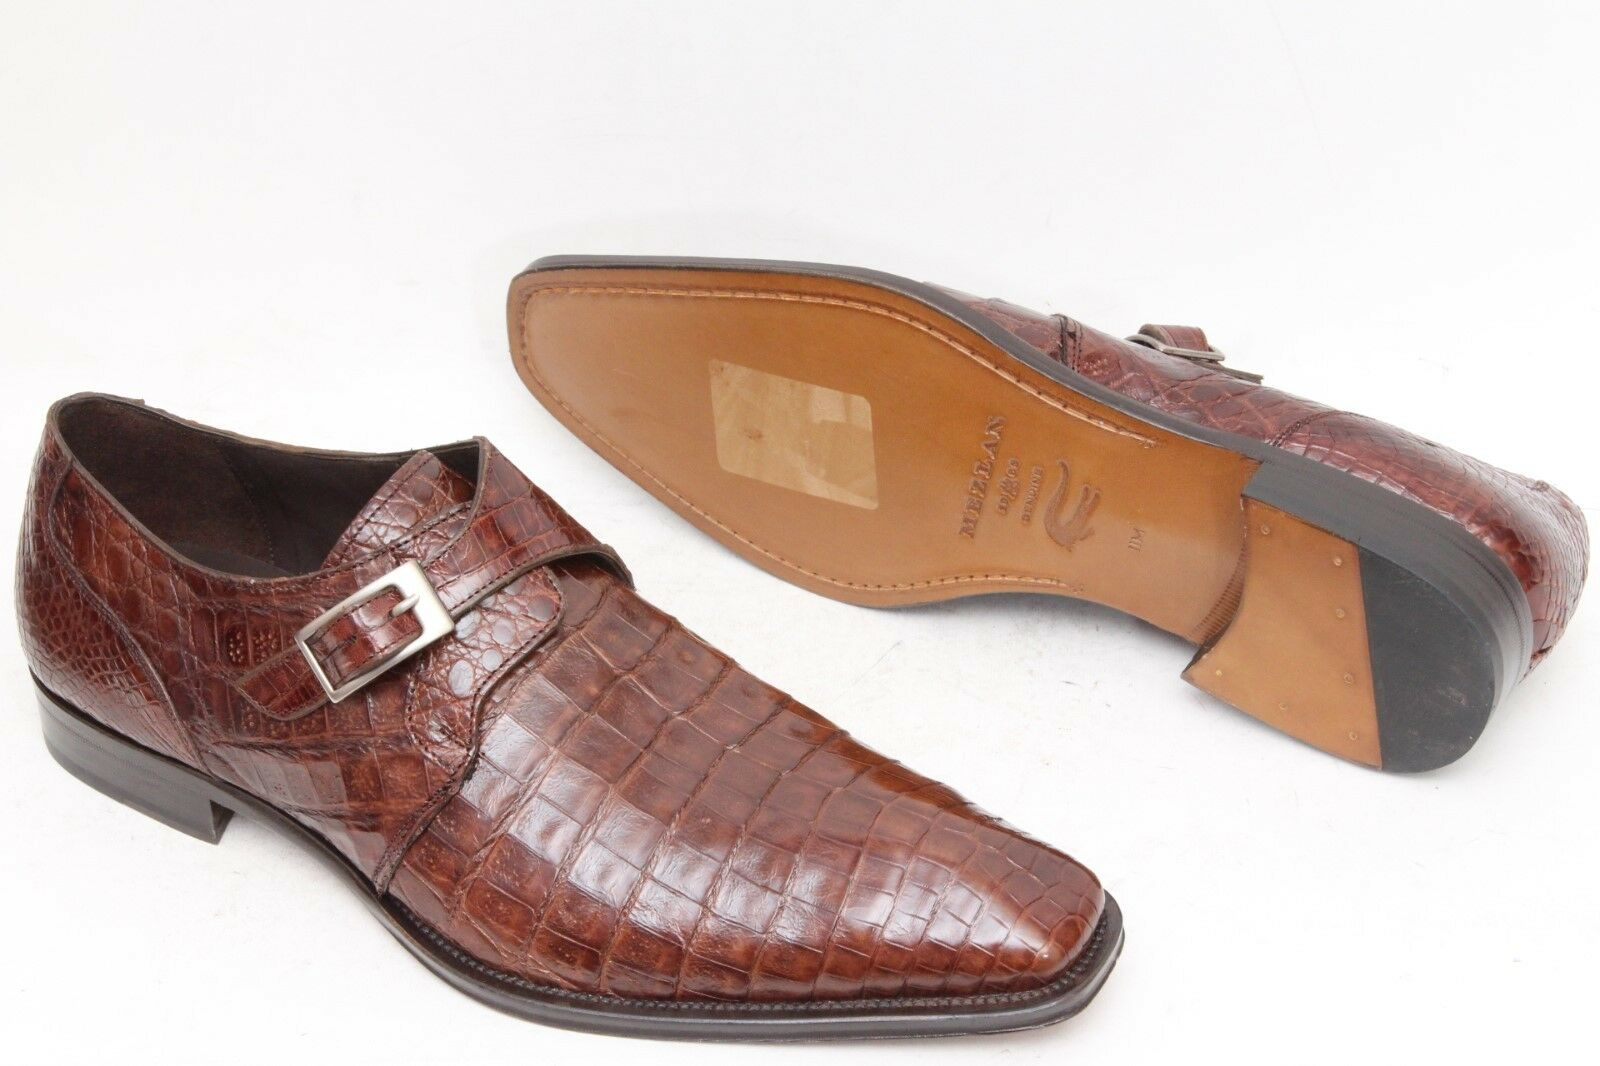 Mezlan 'Gables' Marroneee Leather Crocodile Monk Strap Men's scarpe Dimensione 11 M